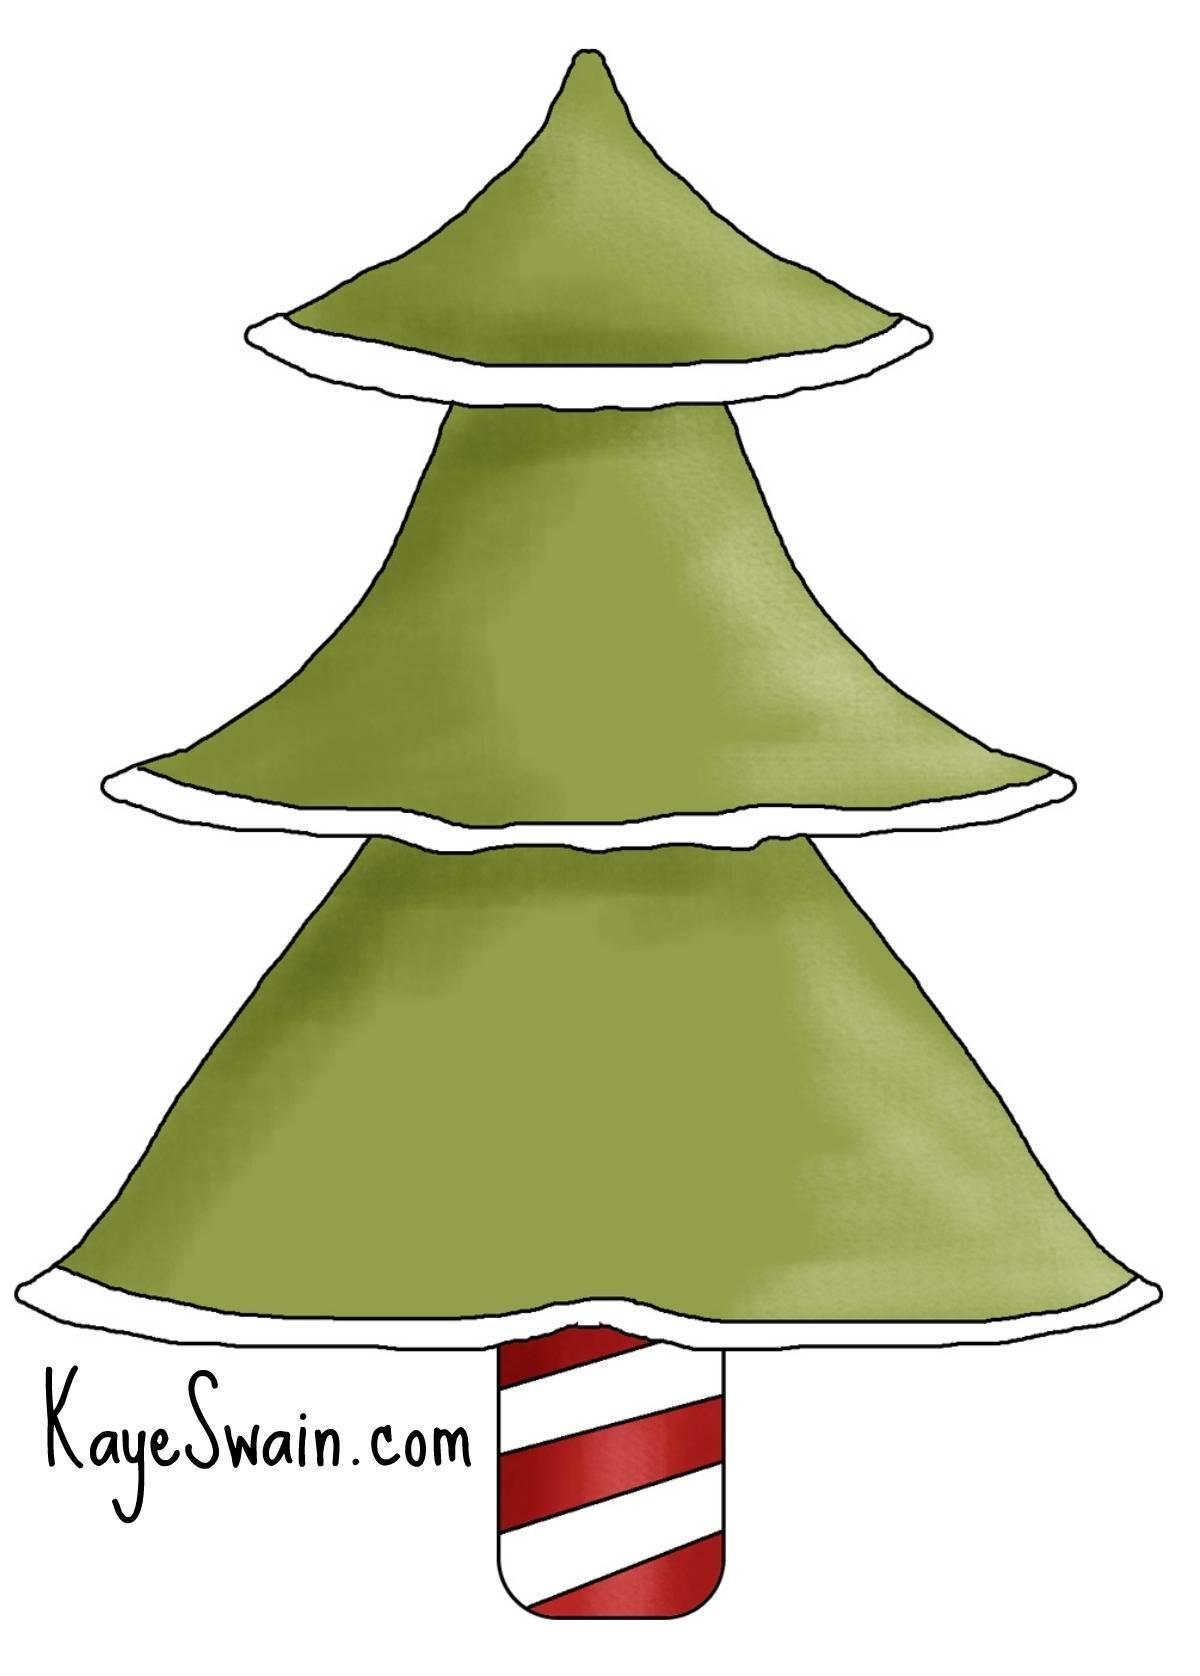 Roseville Sacramento REALTOR Kaye Swain sharing Christmas light joys 1200